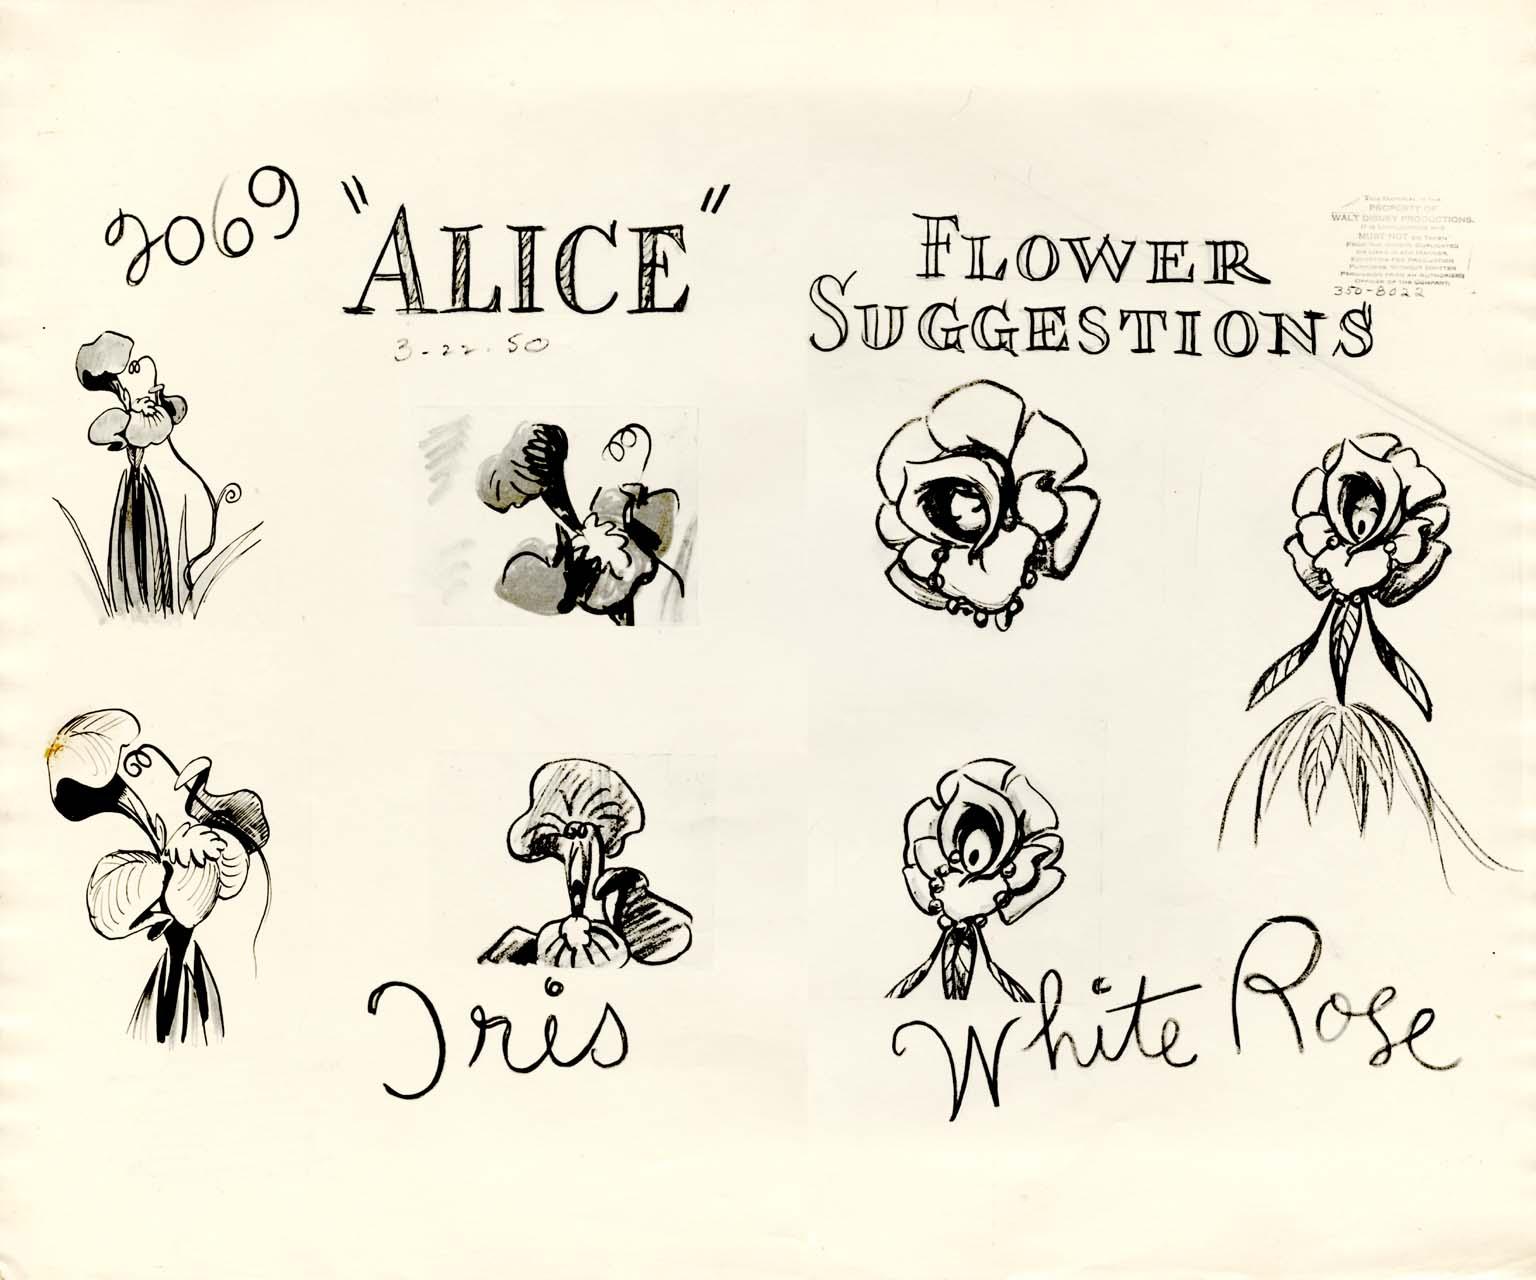 Drawn alice in wonderland rose #9